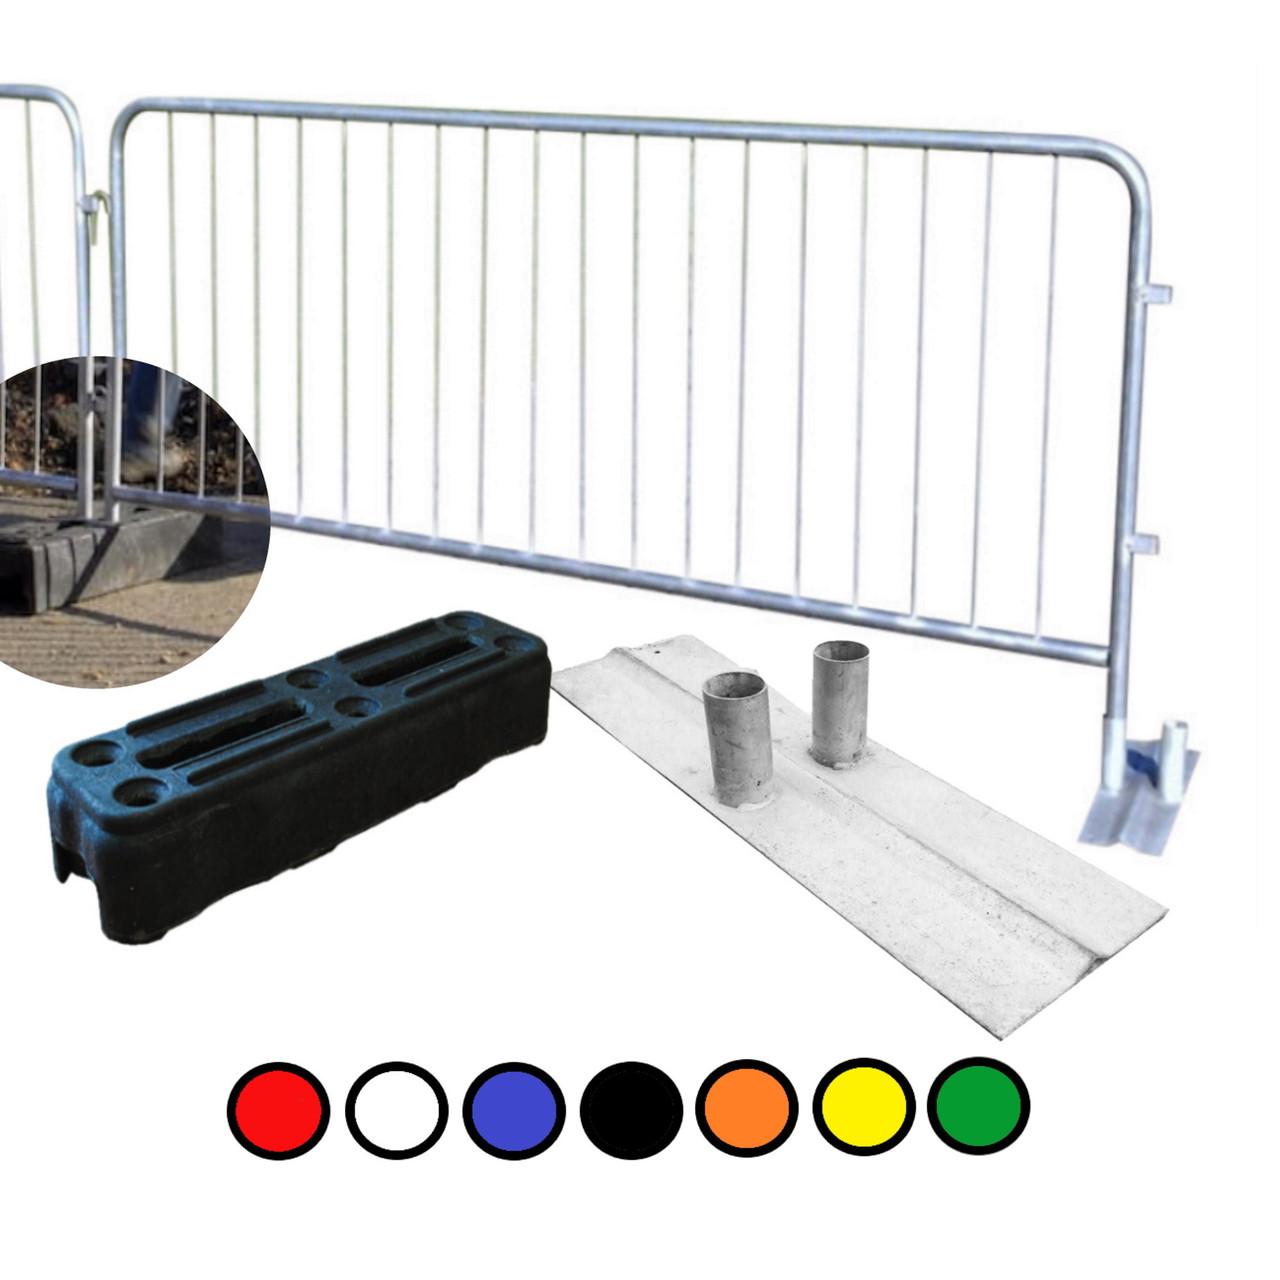 Loose detachable leg metal crowd & site barriers inc rubber blocks